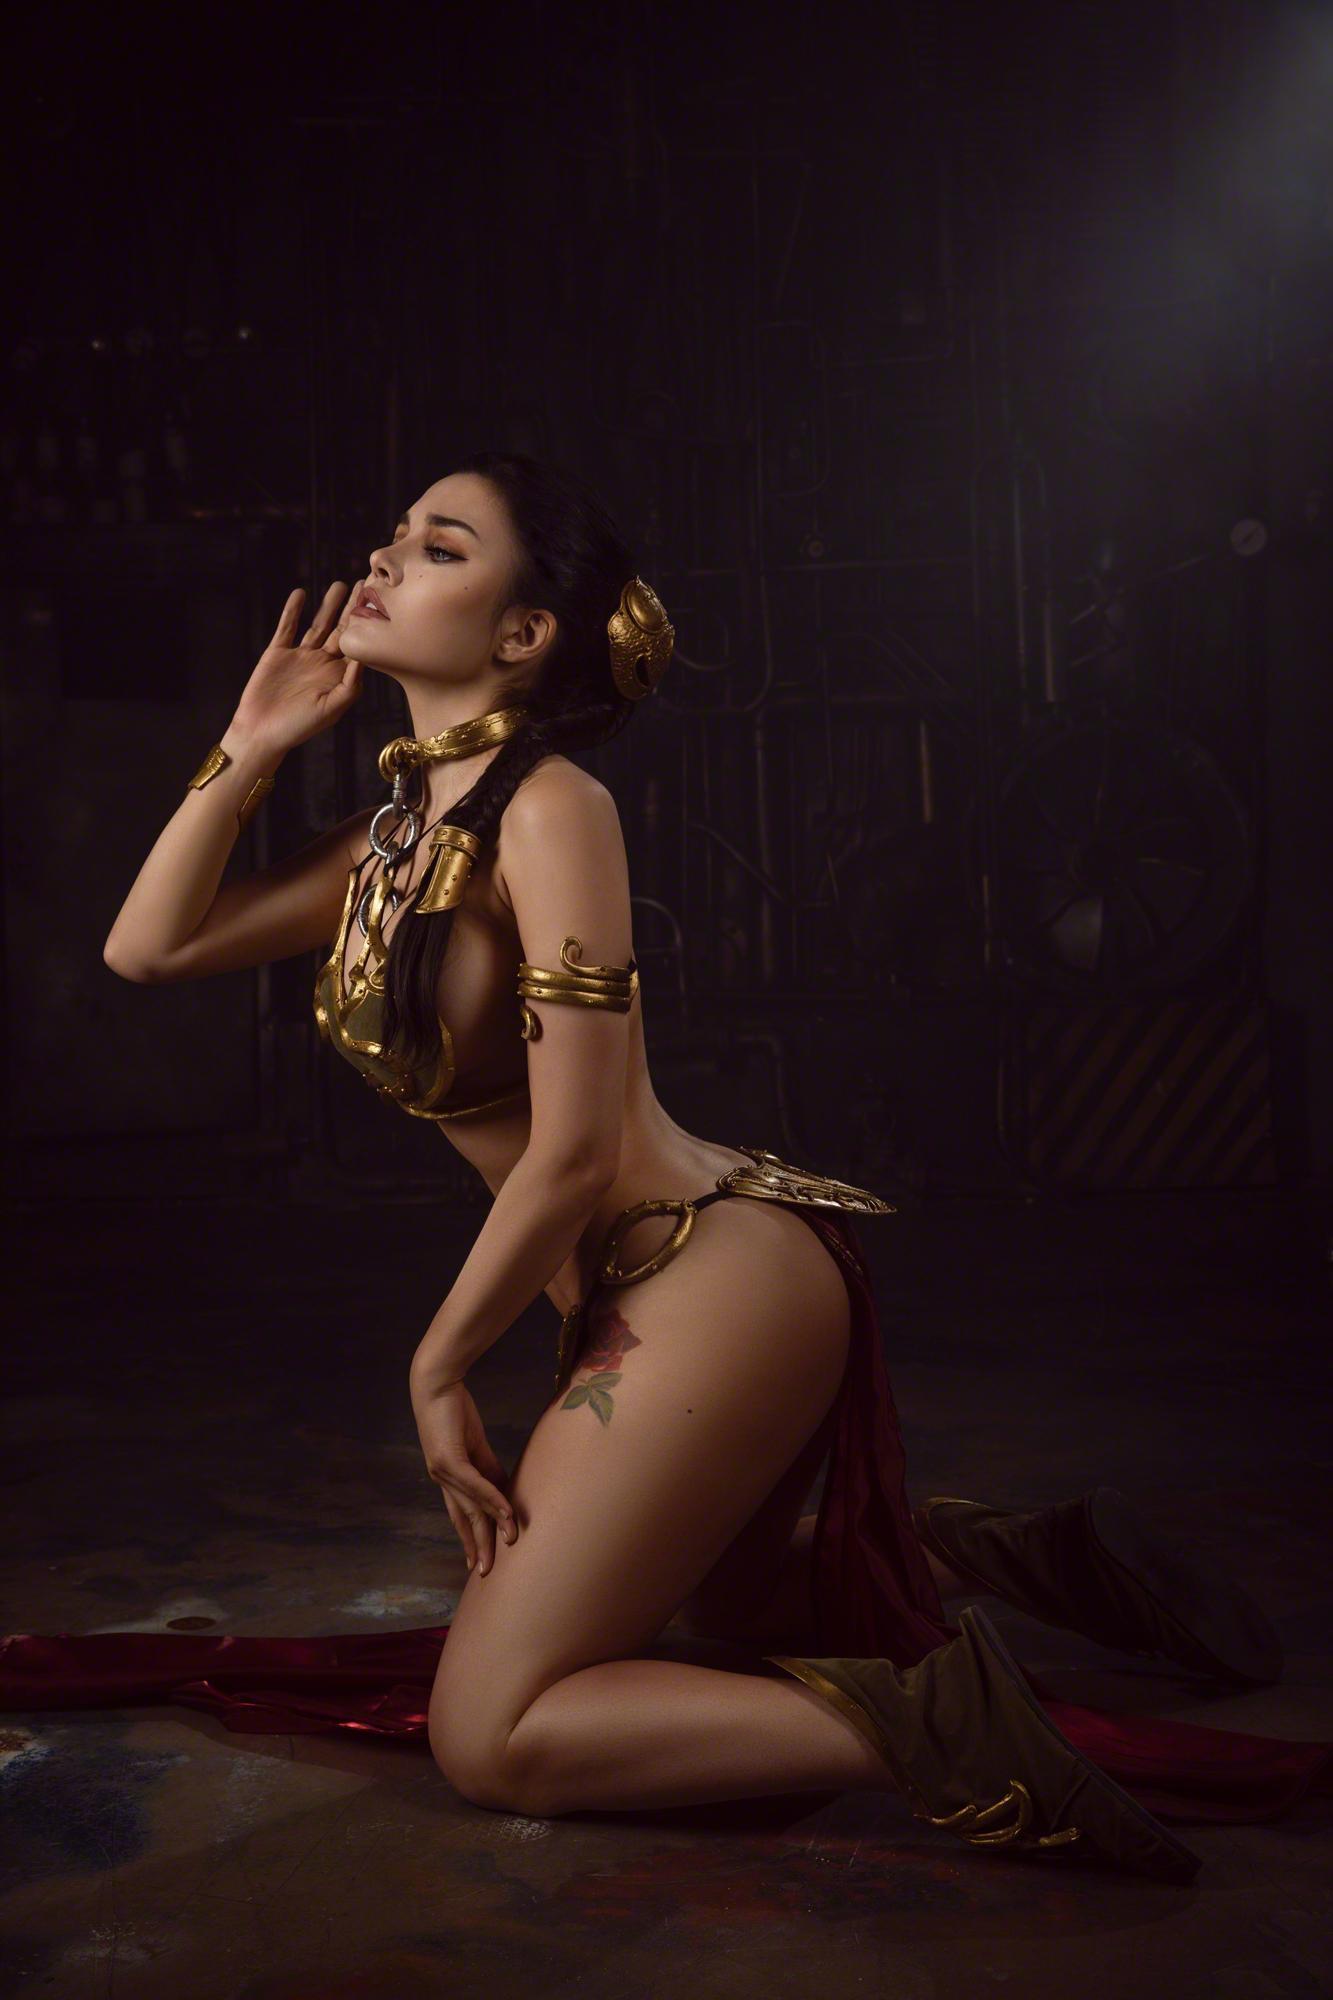 Kalinka Fox Princess Leia Slave Cosplay Set Leaked Nbbvrc